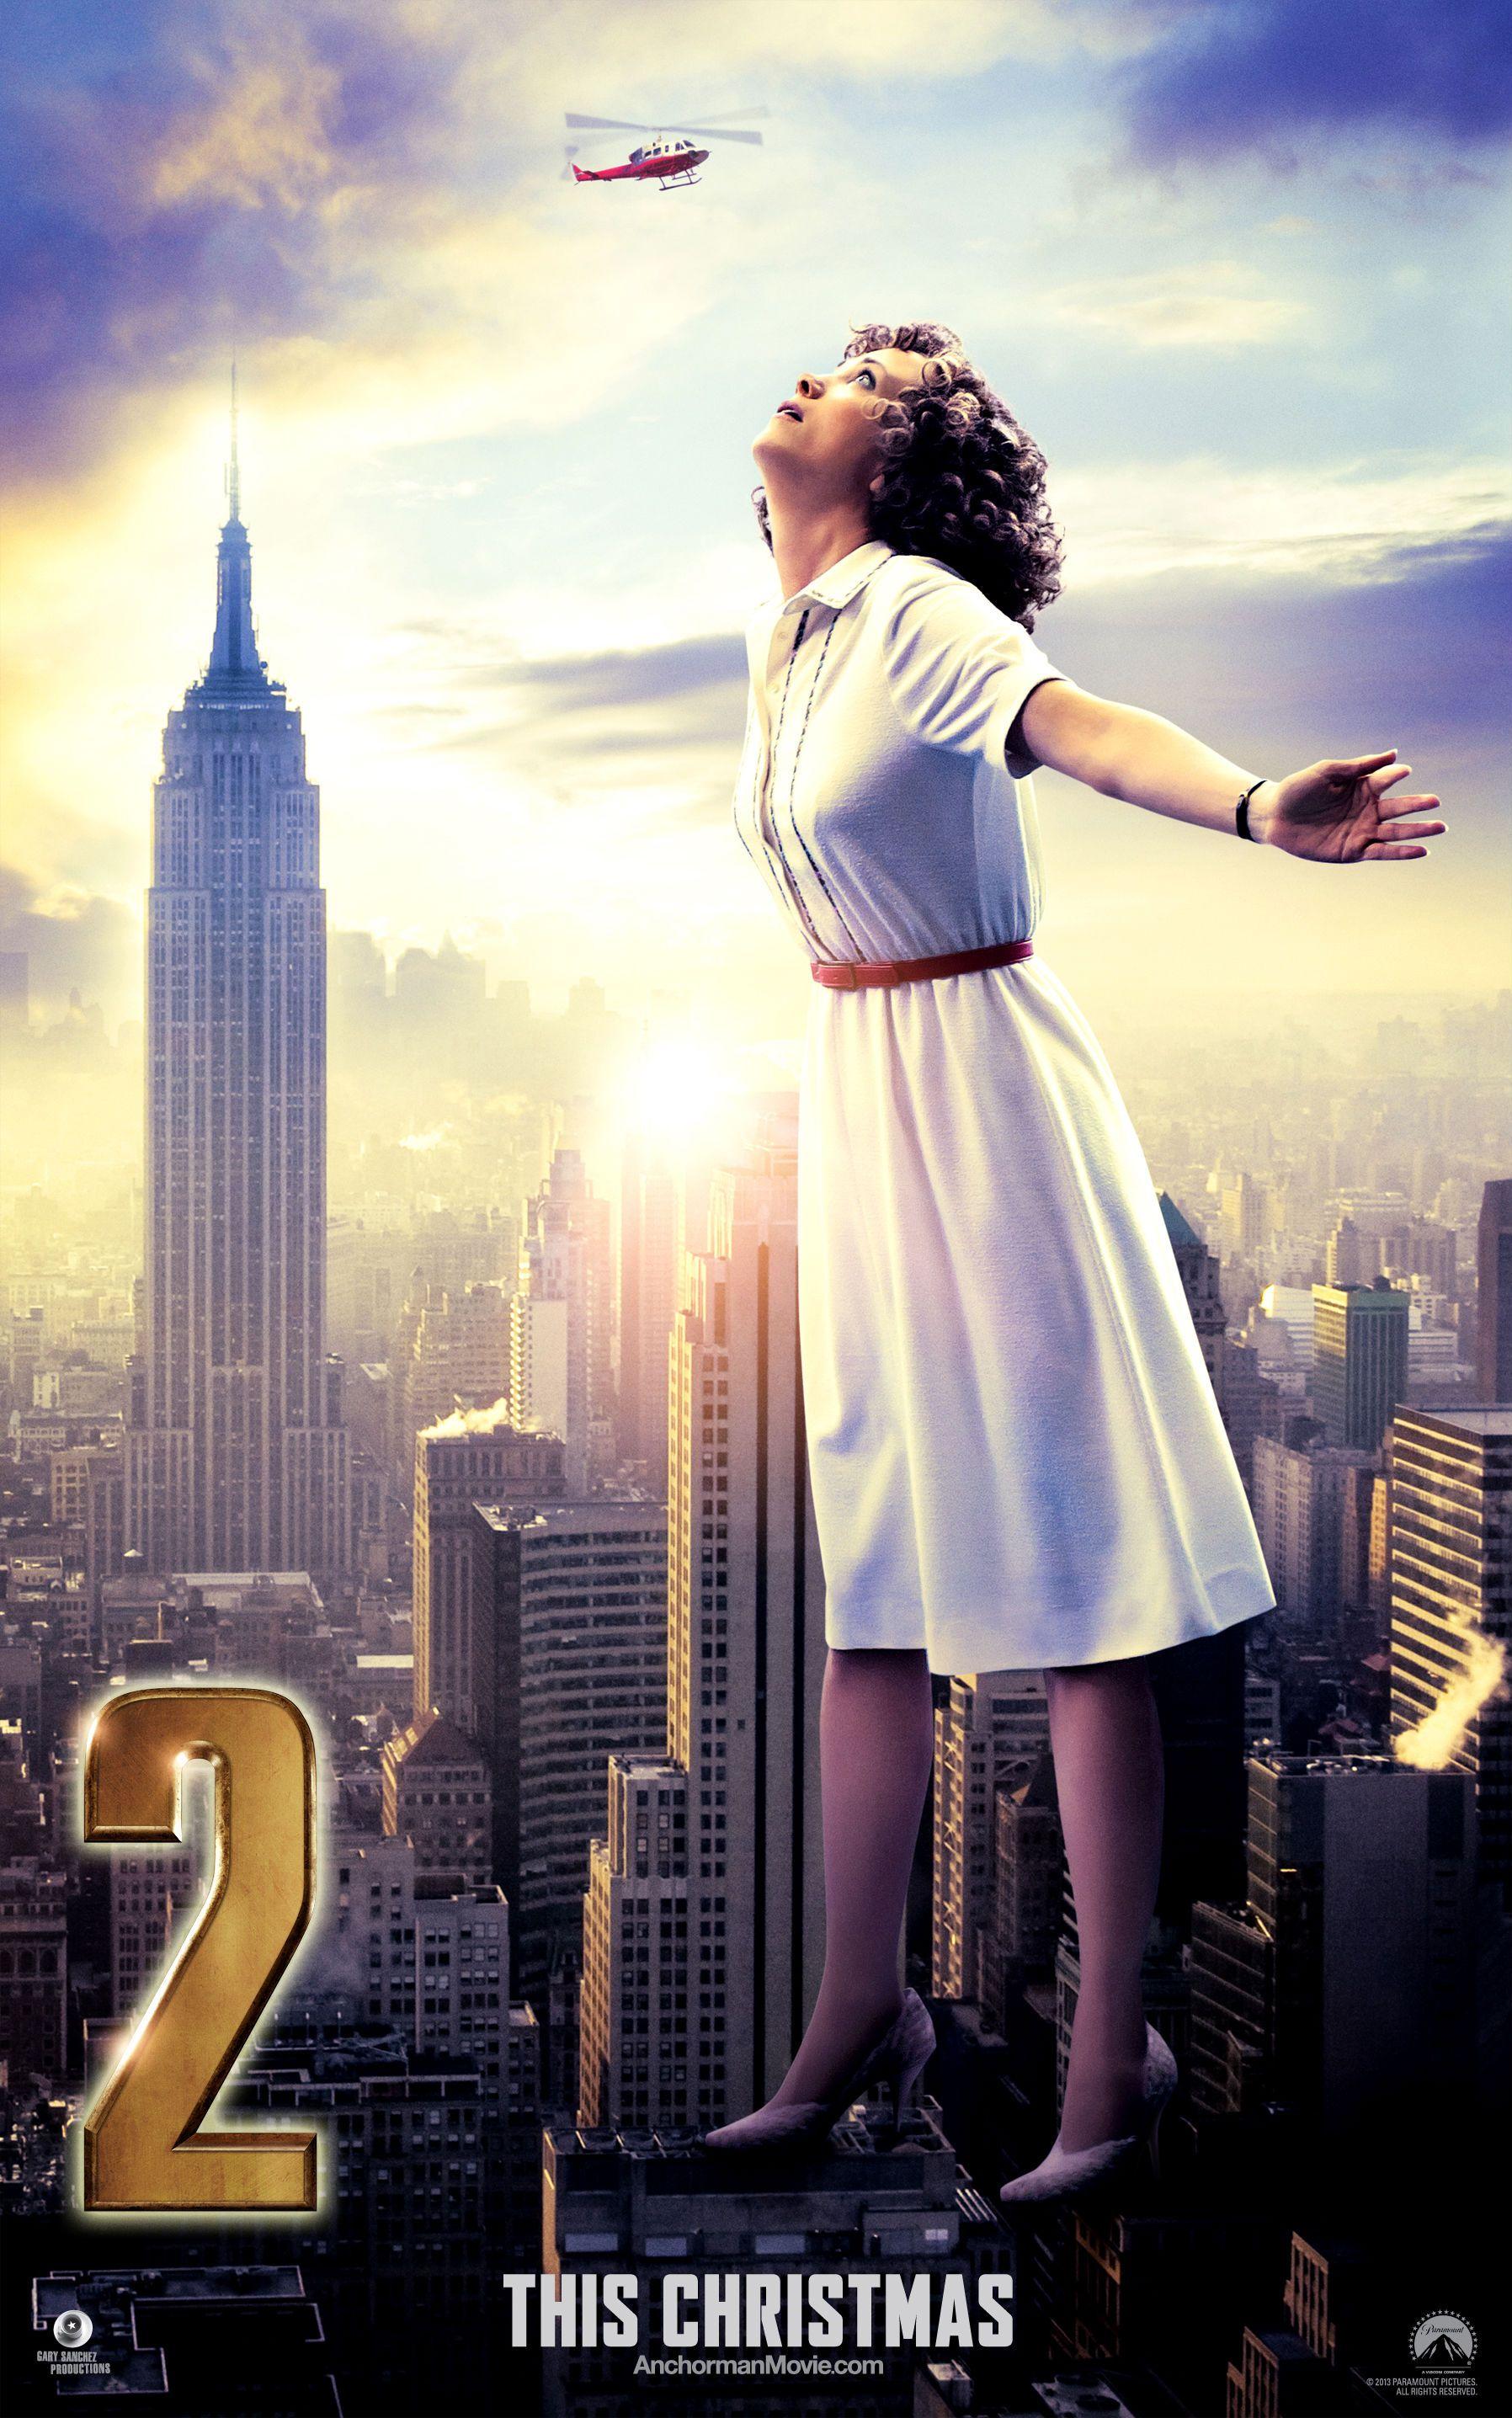 Anchorman 2 Character Posters Kristen Wiig Soars Anchorman 2